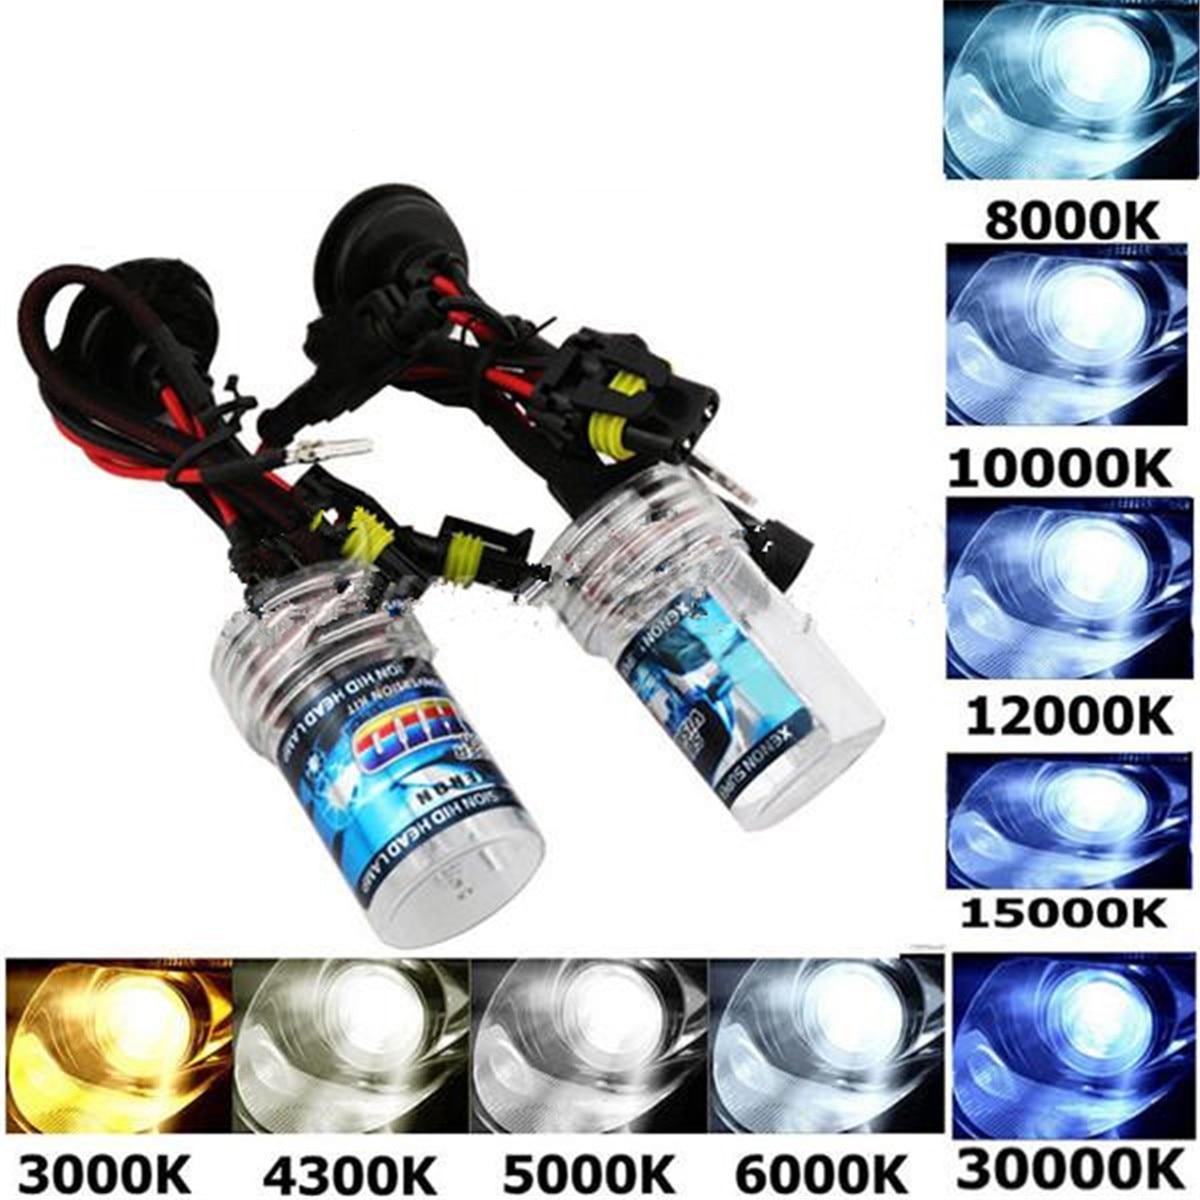 1Pair 12V 55W H7 Car Headlights Xenon Lamp Bulbs 3000K-30000K 4600LM-2600LM  For HID  Headlamp Bulbs